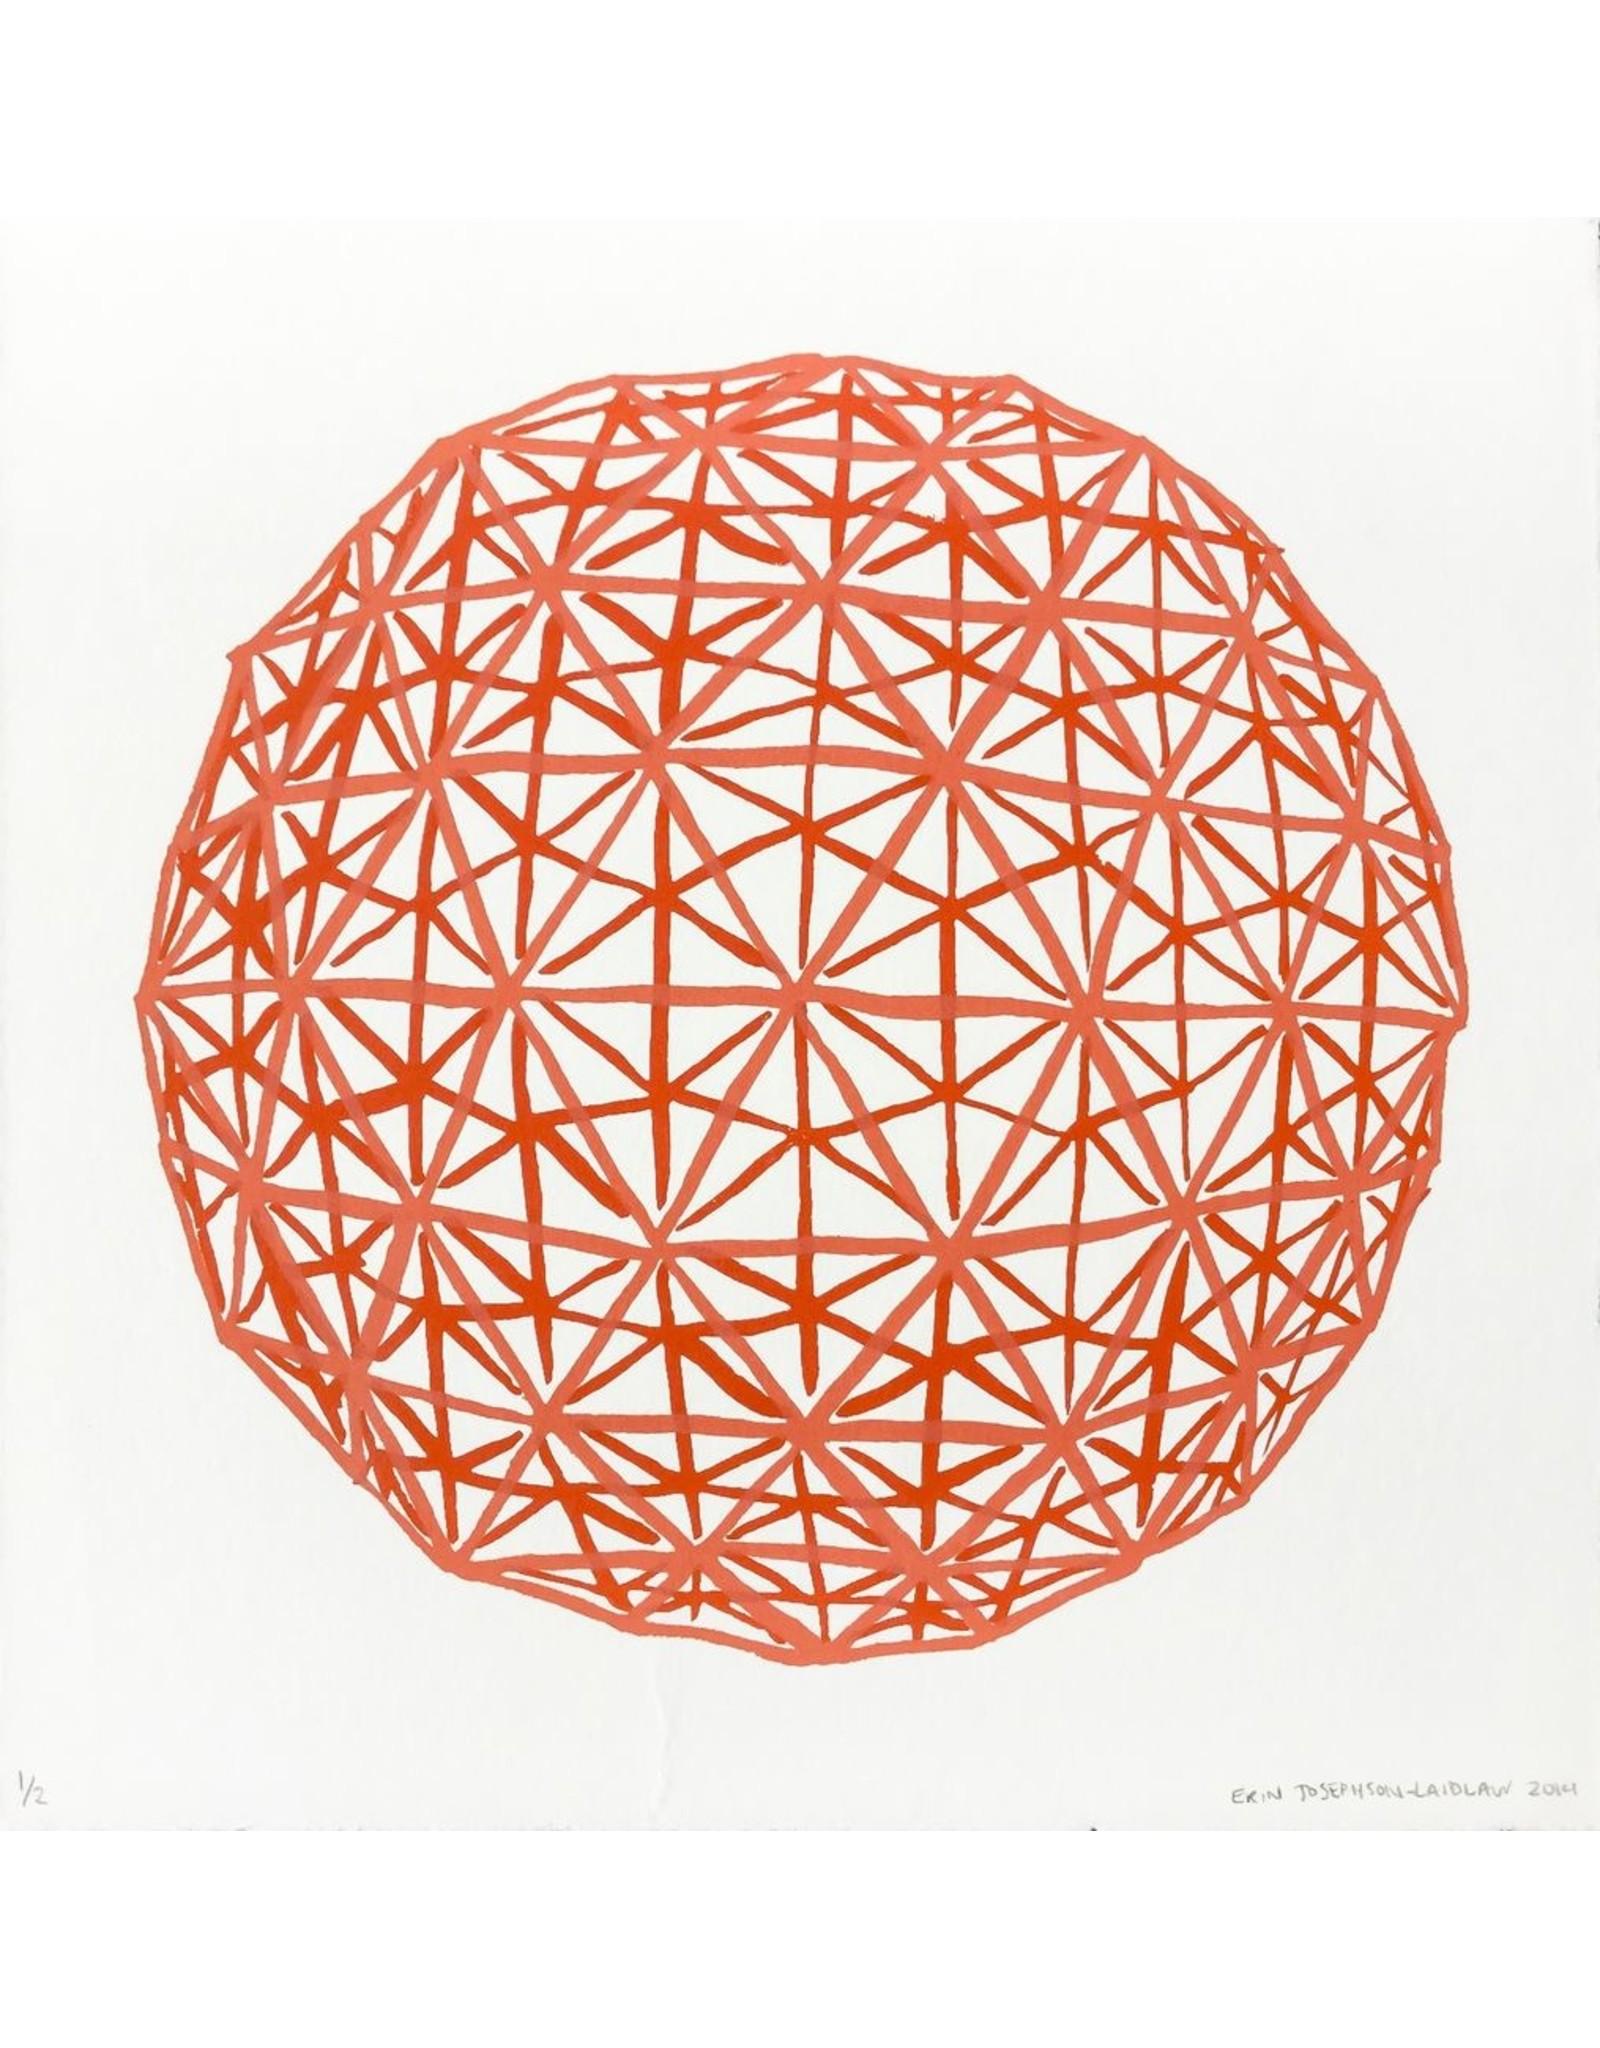 Josephson-Laidlaw, Erin Orange Dome, Erin Josephson-Laidlaw